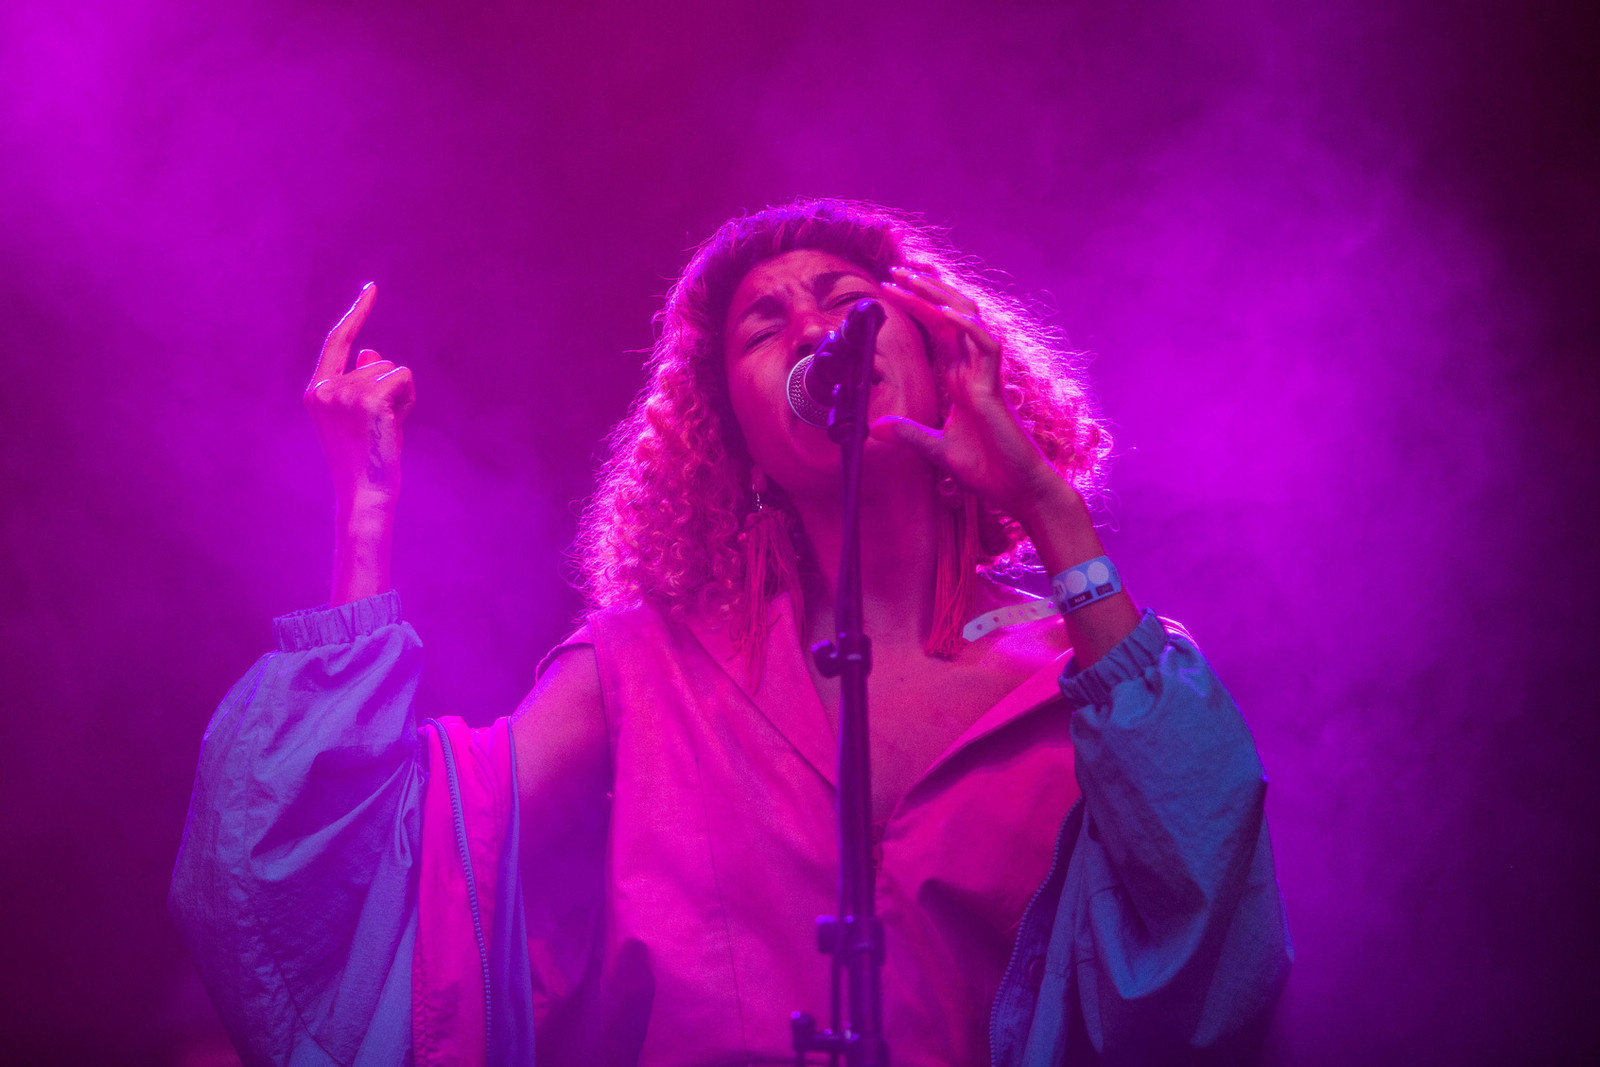 Oya Music Festival Oslo Norway 2017